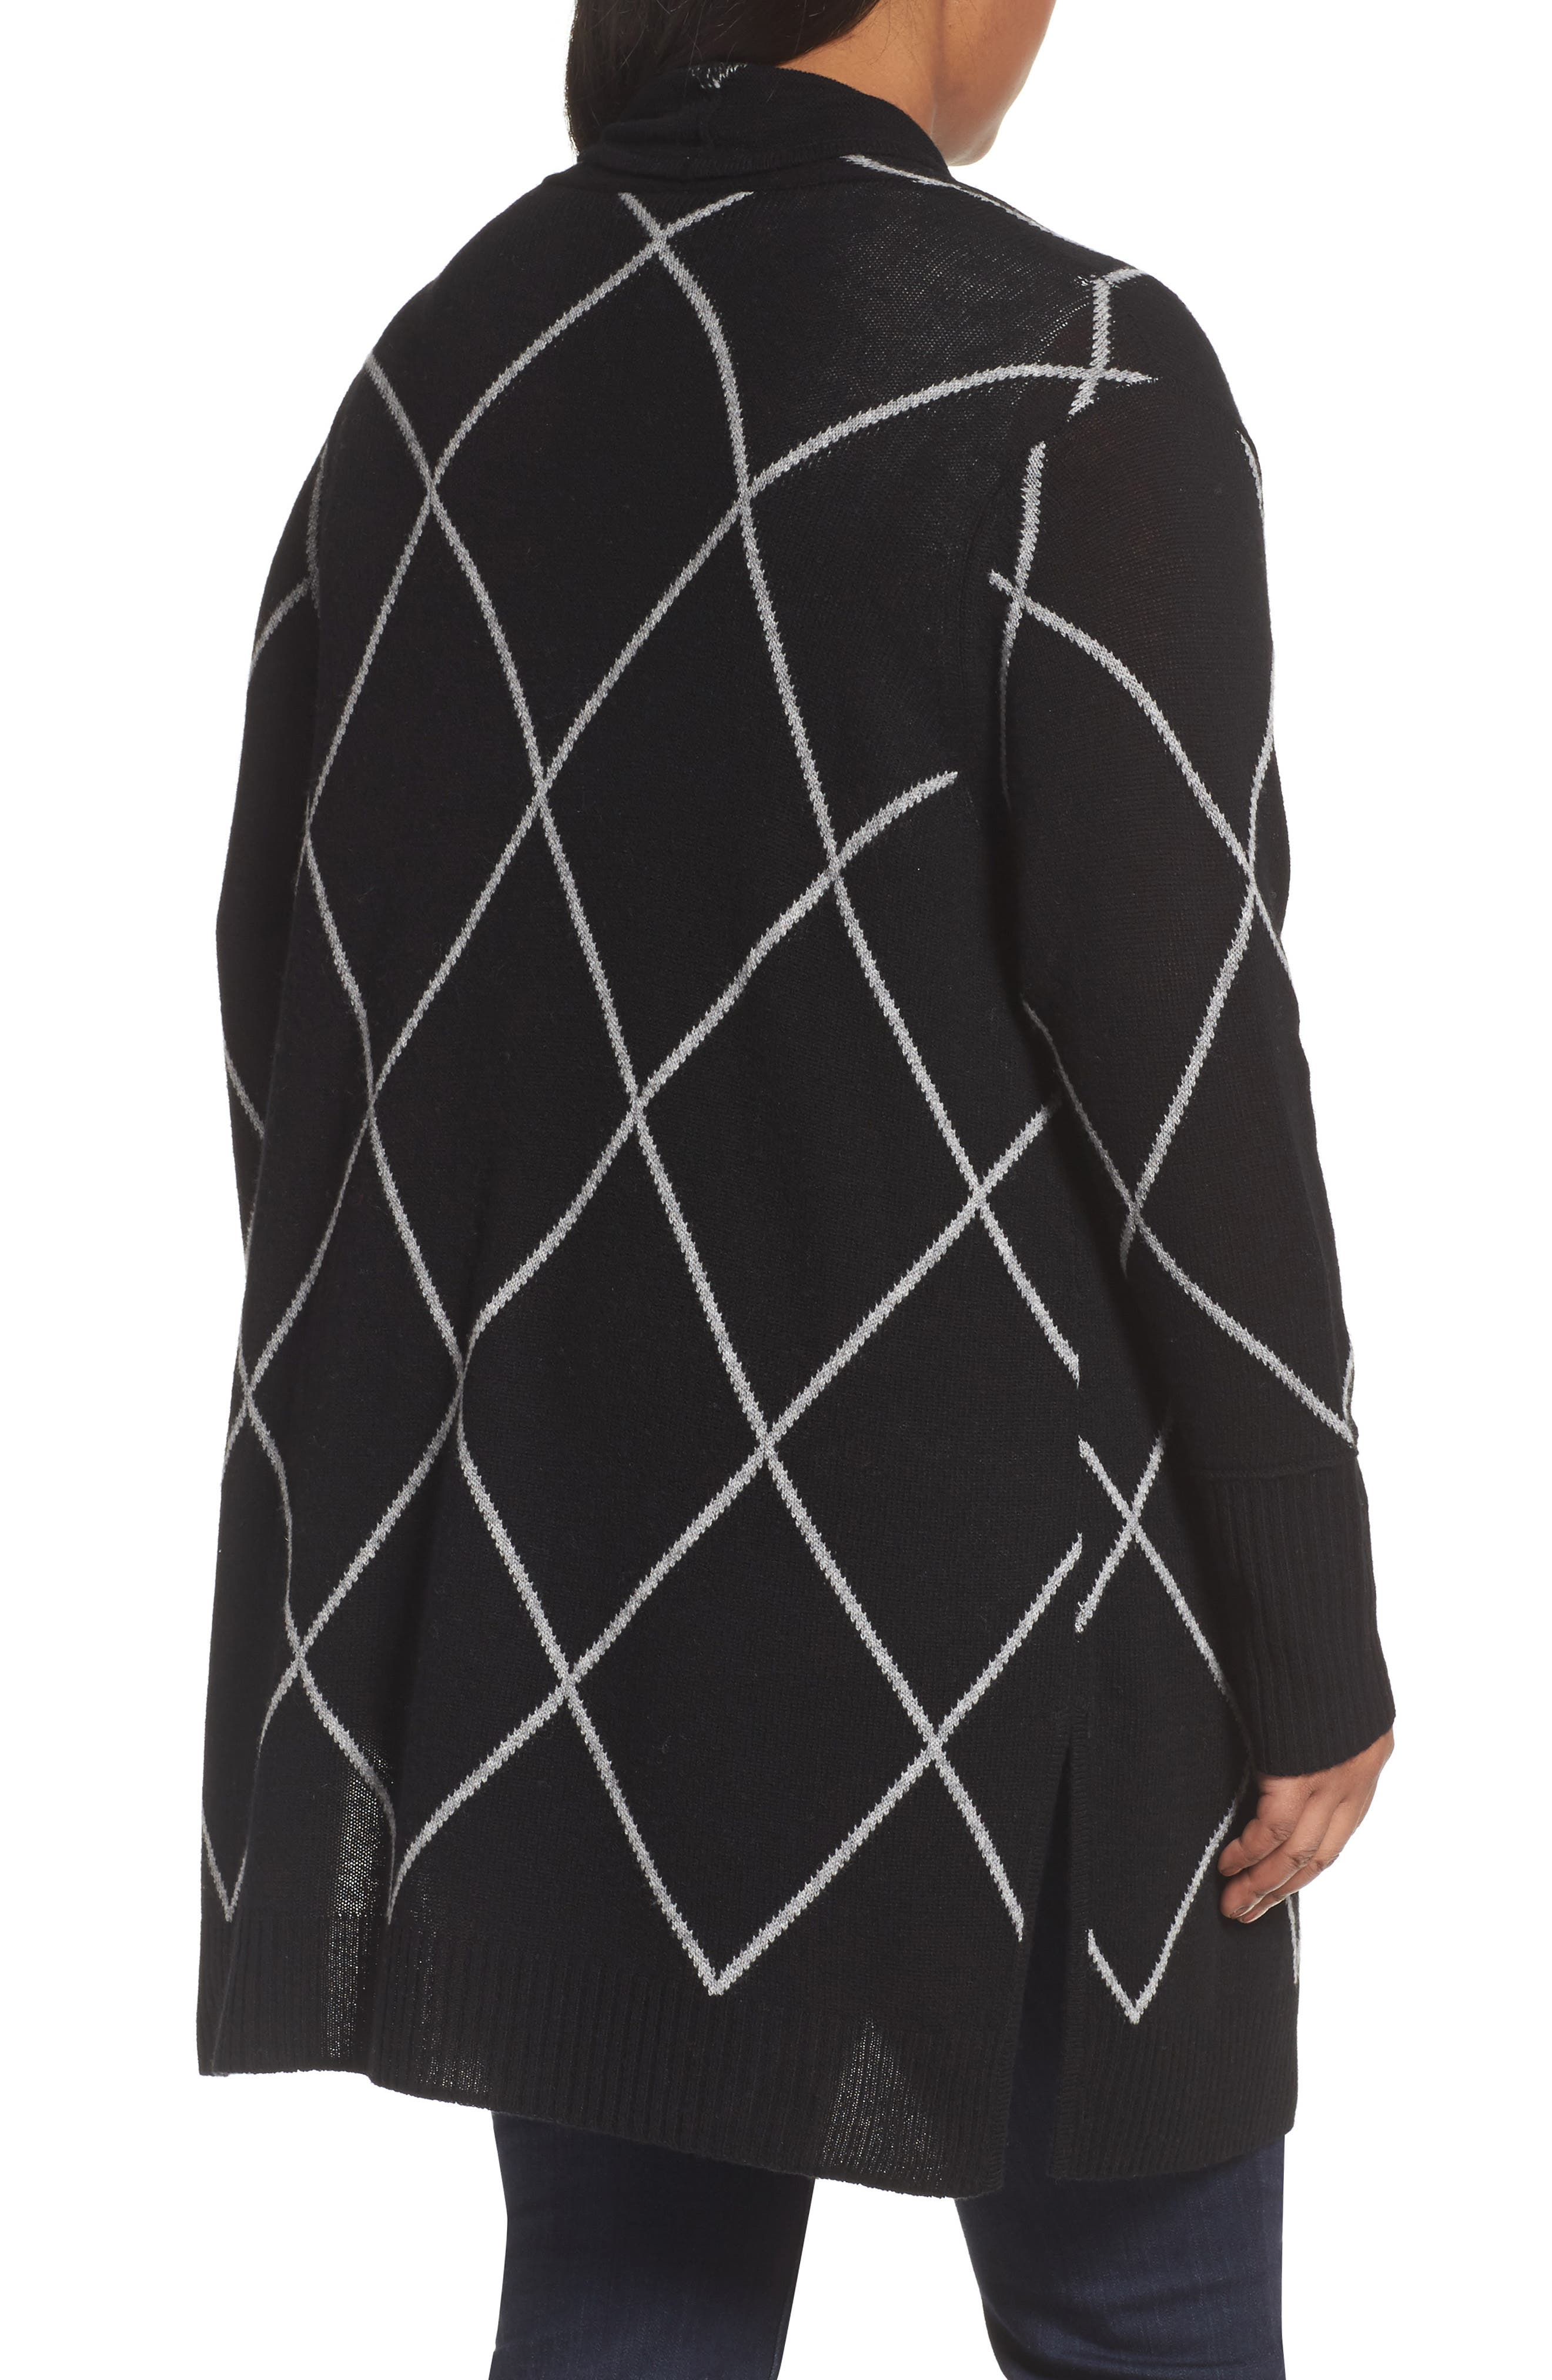 Windowpane Wool & Cashmere Cardigan,                             Alternate thumbnail 3, color,                             Black Windowpane